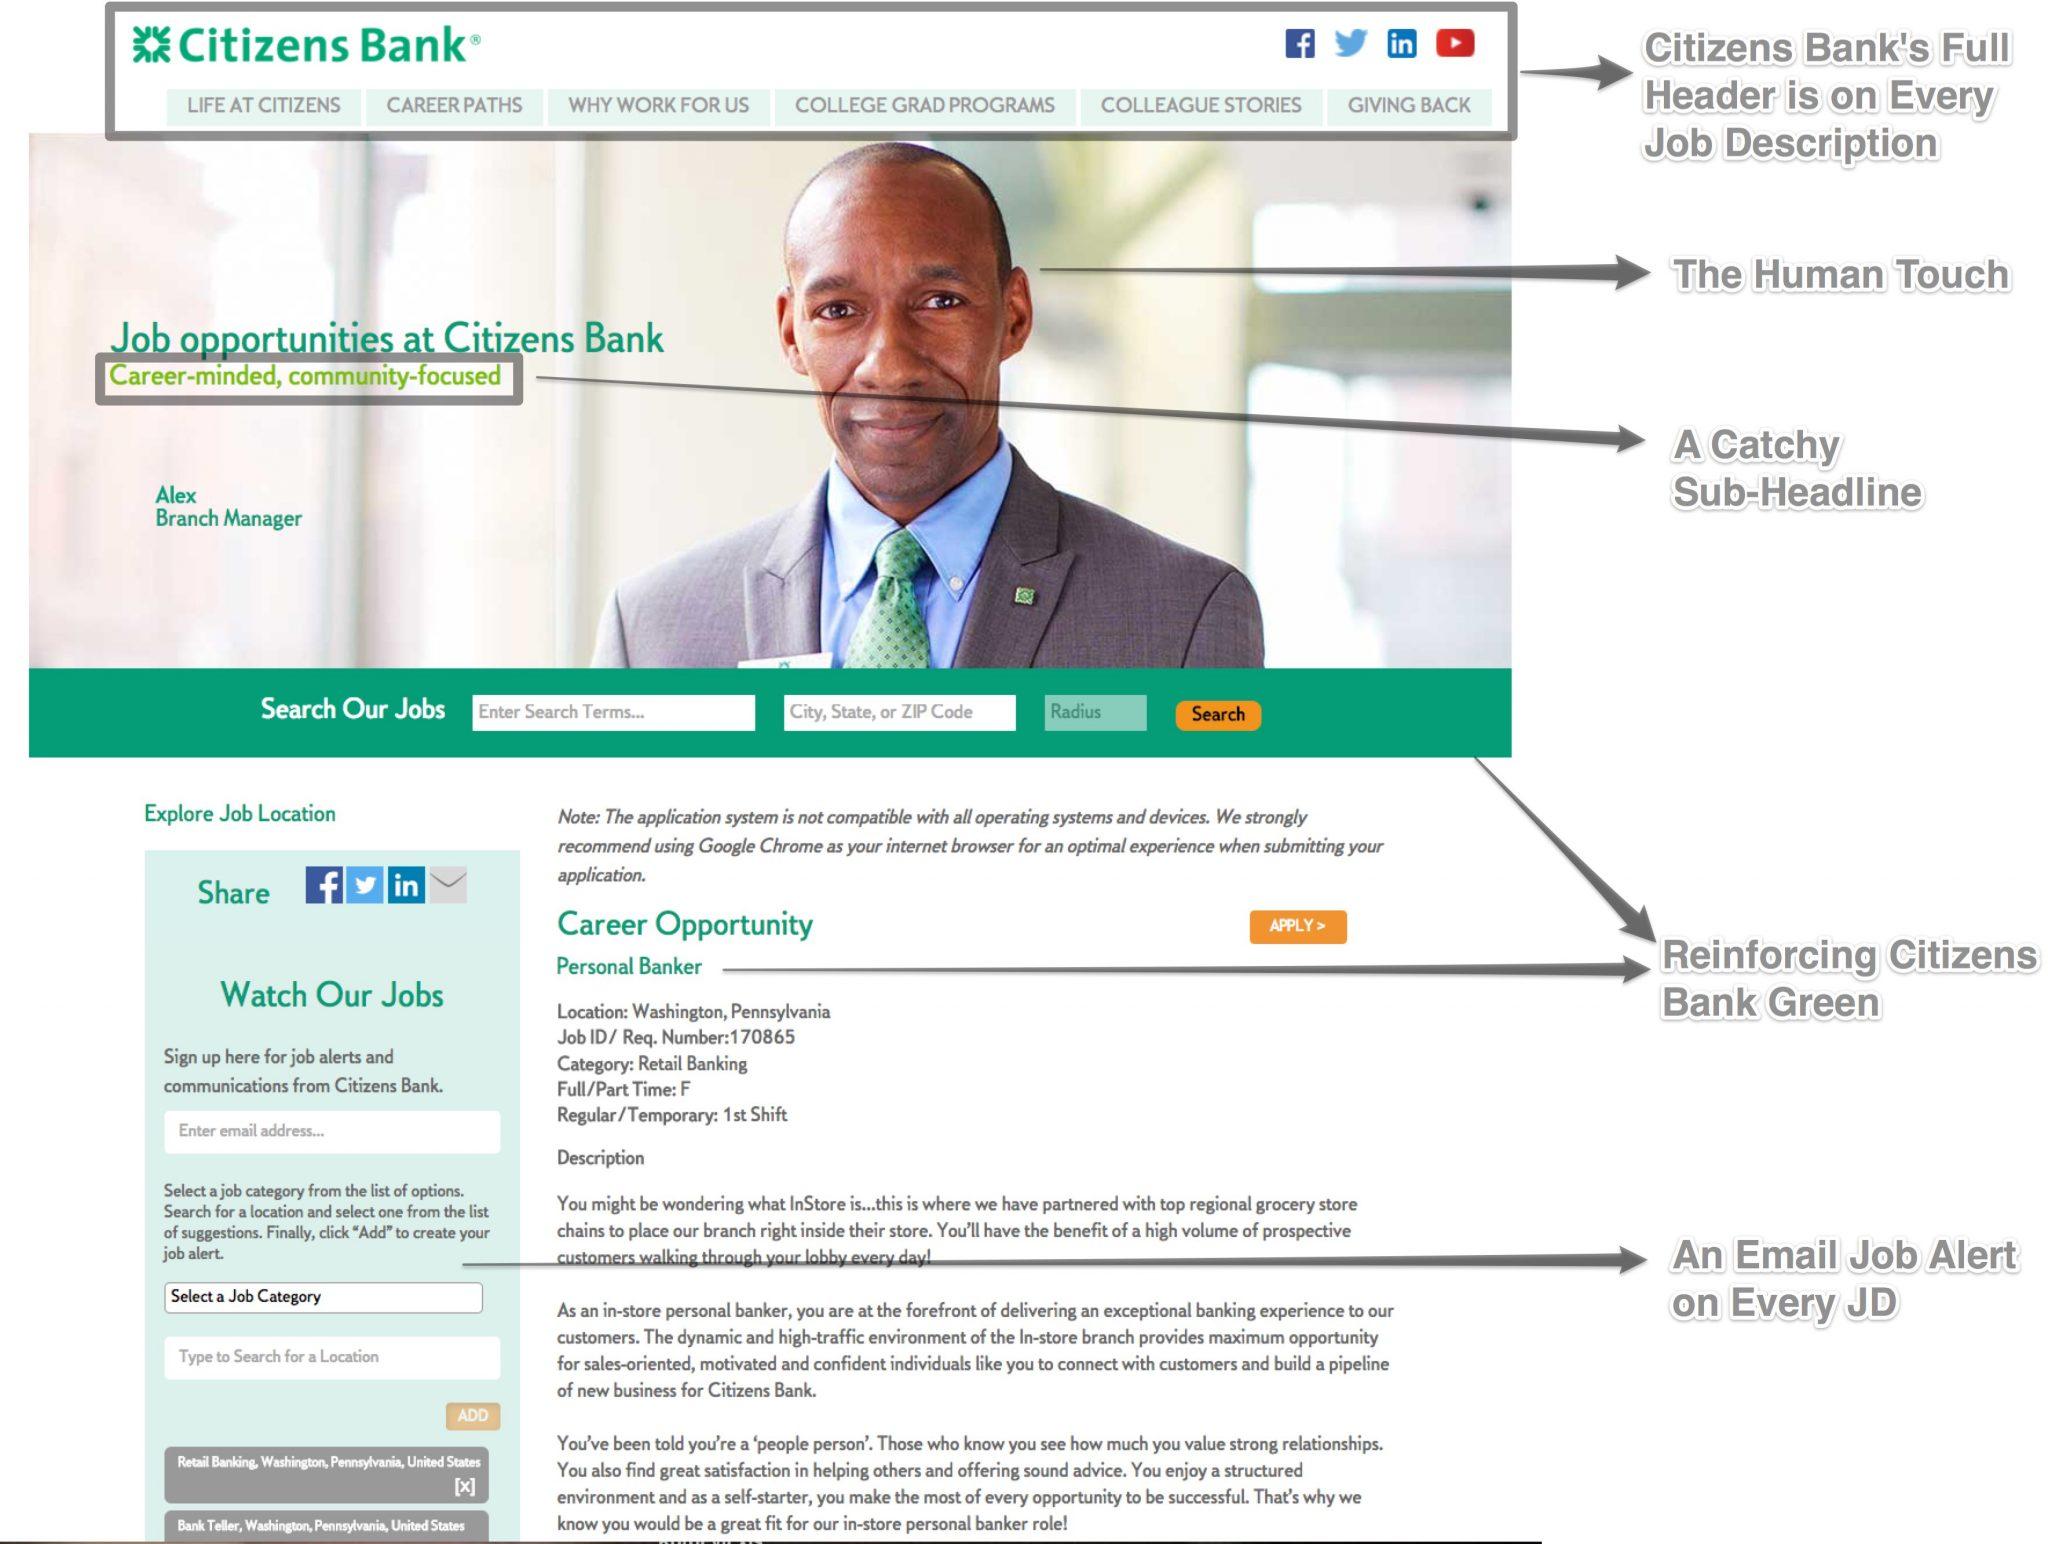 Citizens Bank Branded Job Description 1 | Ongig Blog